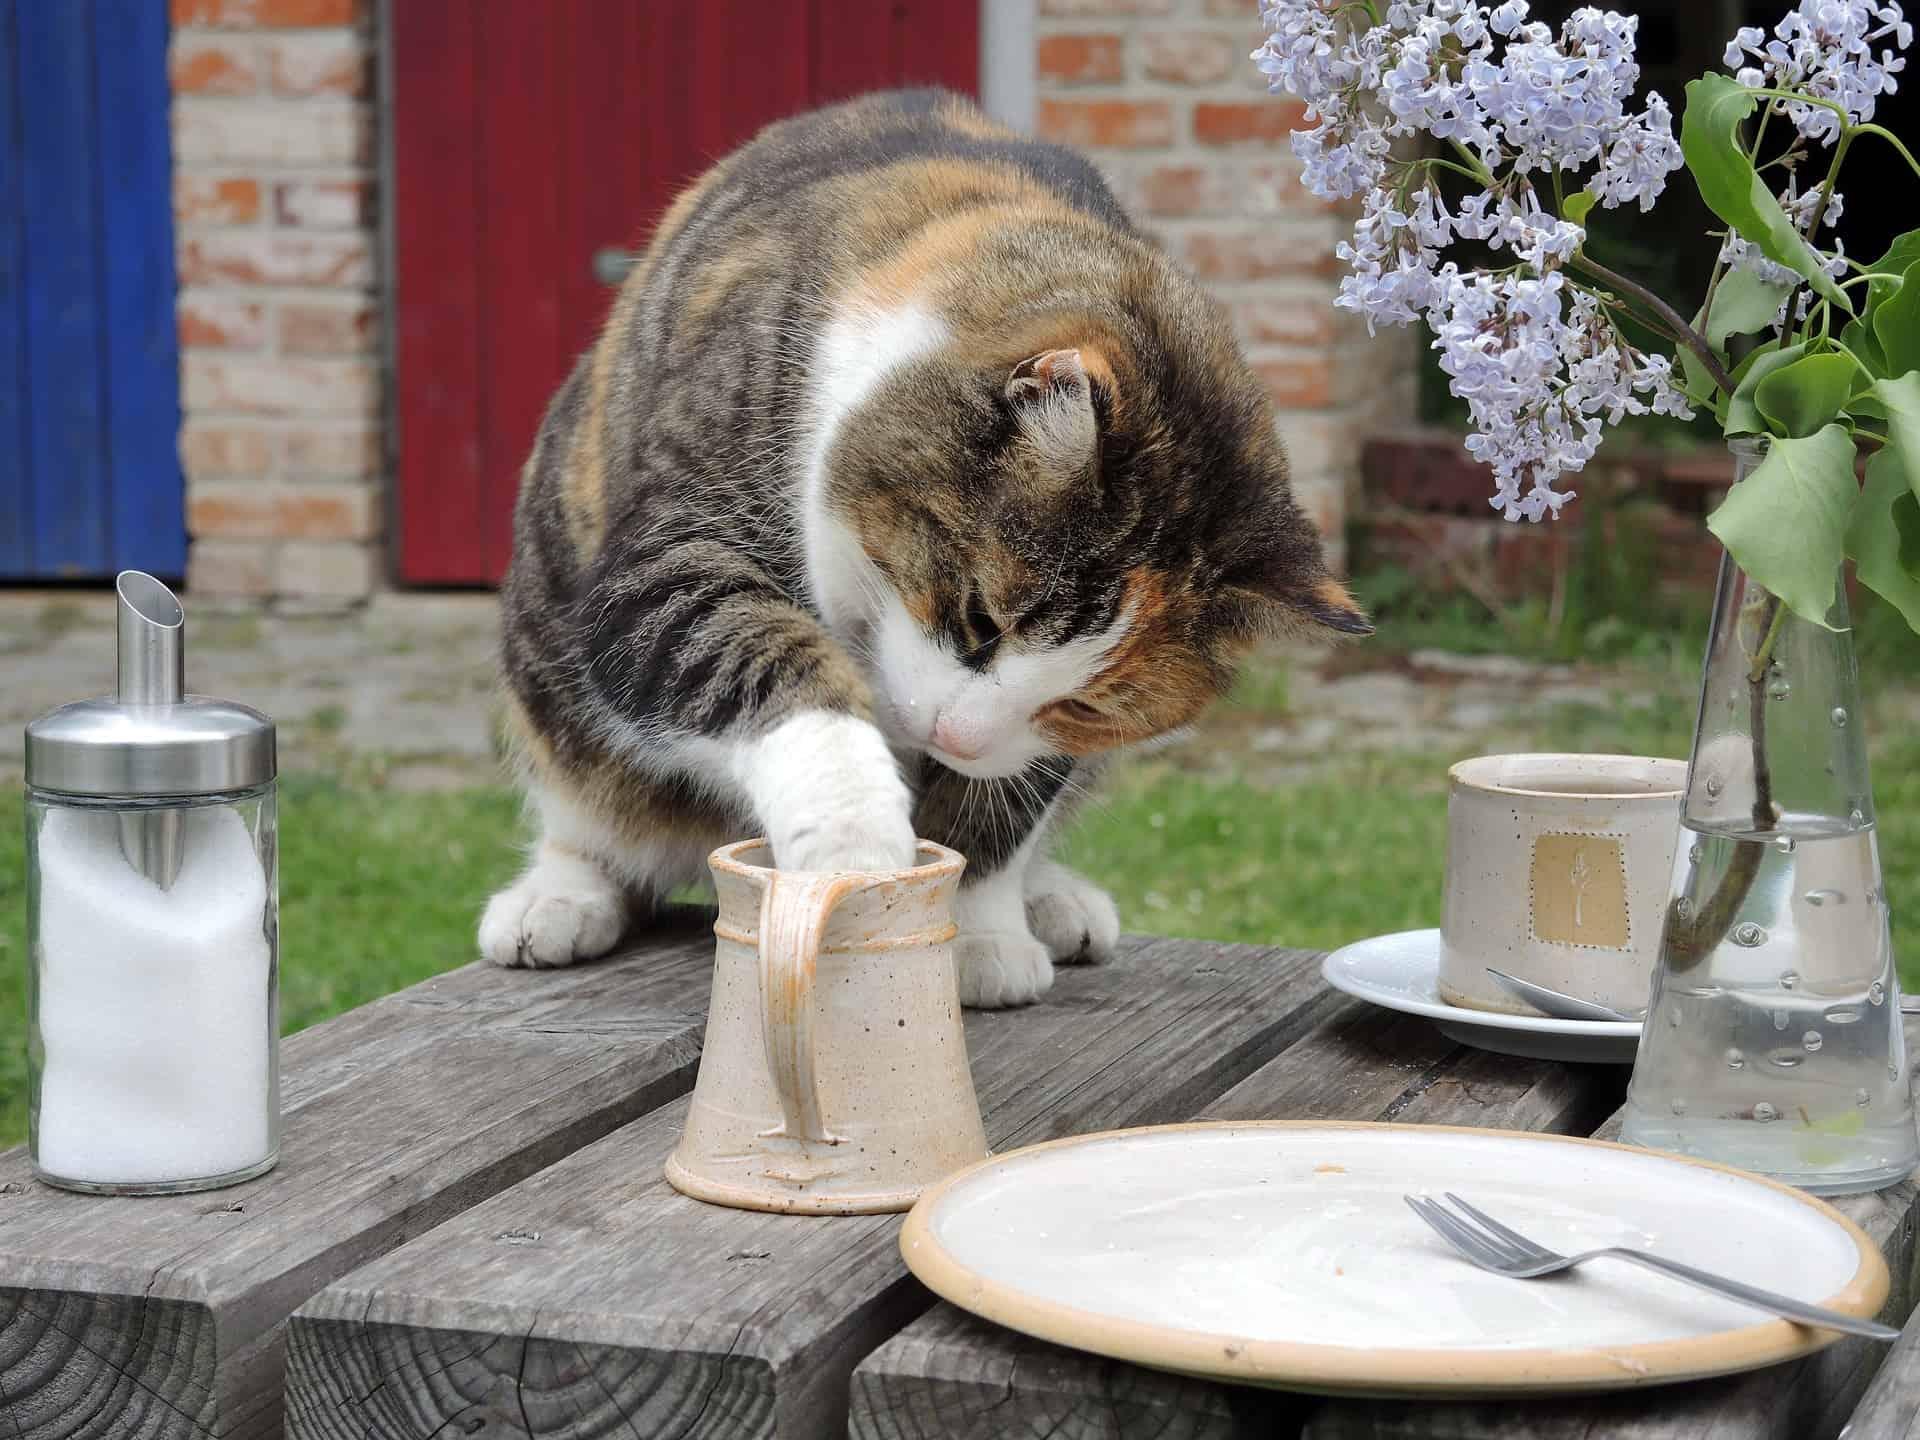 are cats lactose intolerant?